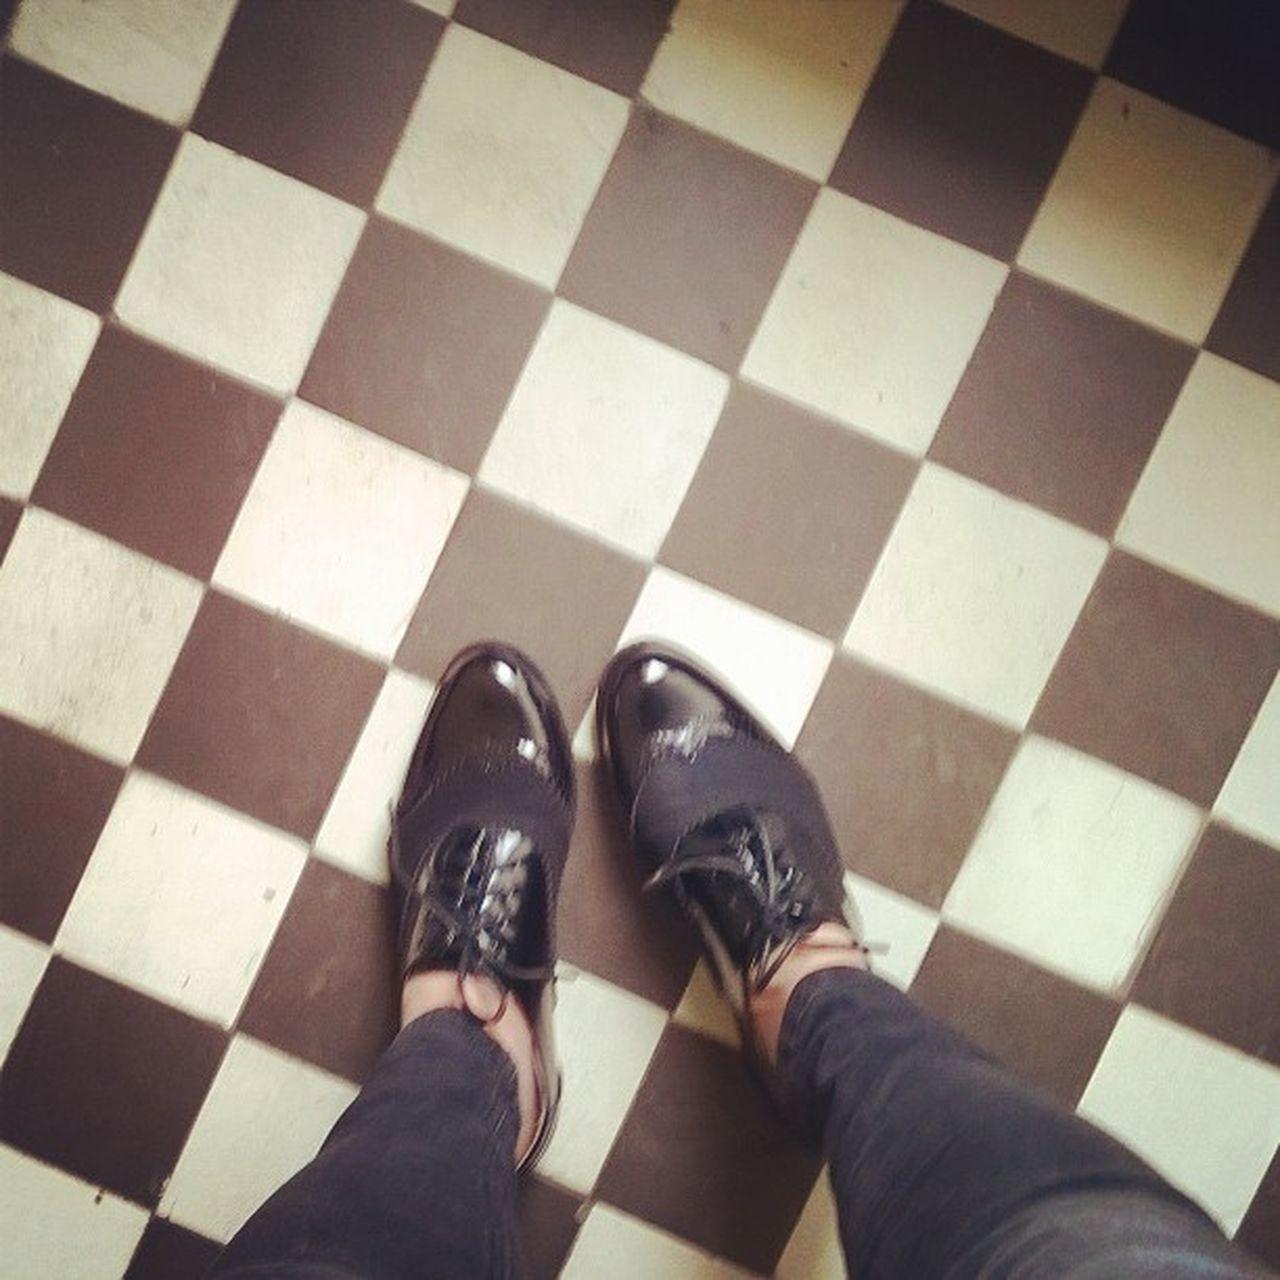 Shoes Pepita Leg Megintalábam Kockás Jeans Indie Braun Eveningchill Mik Urbanizers Urbanizersbudapest BP